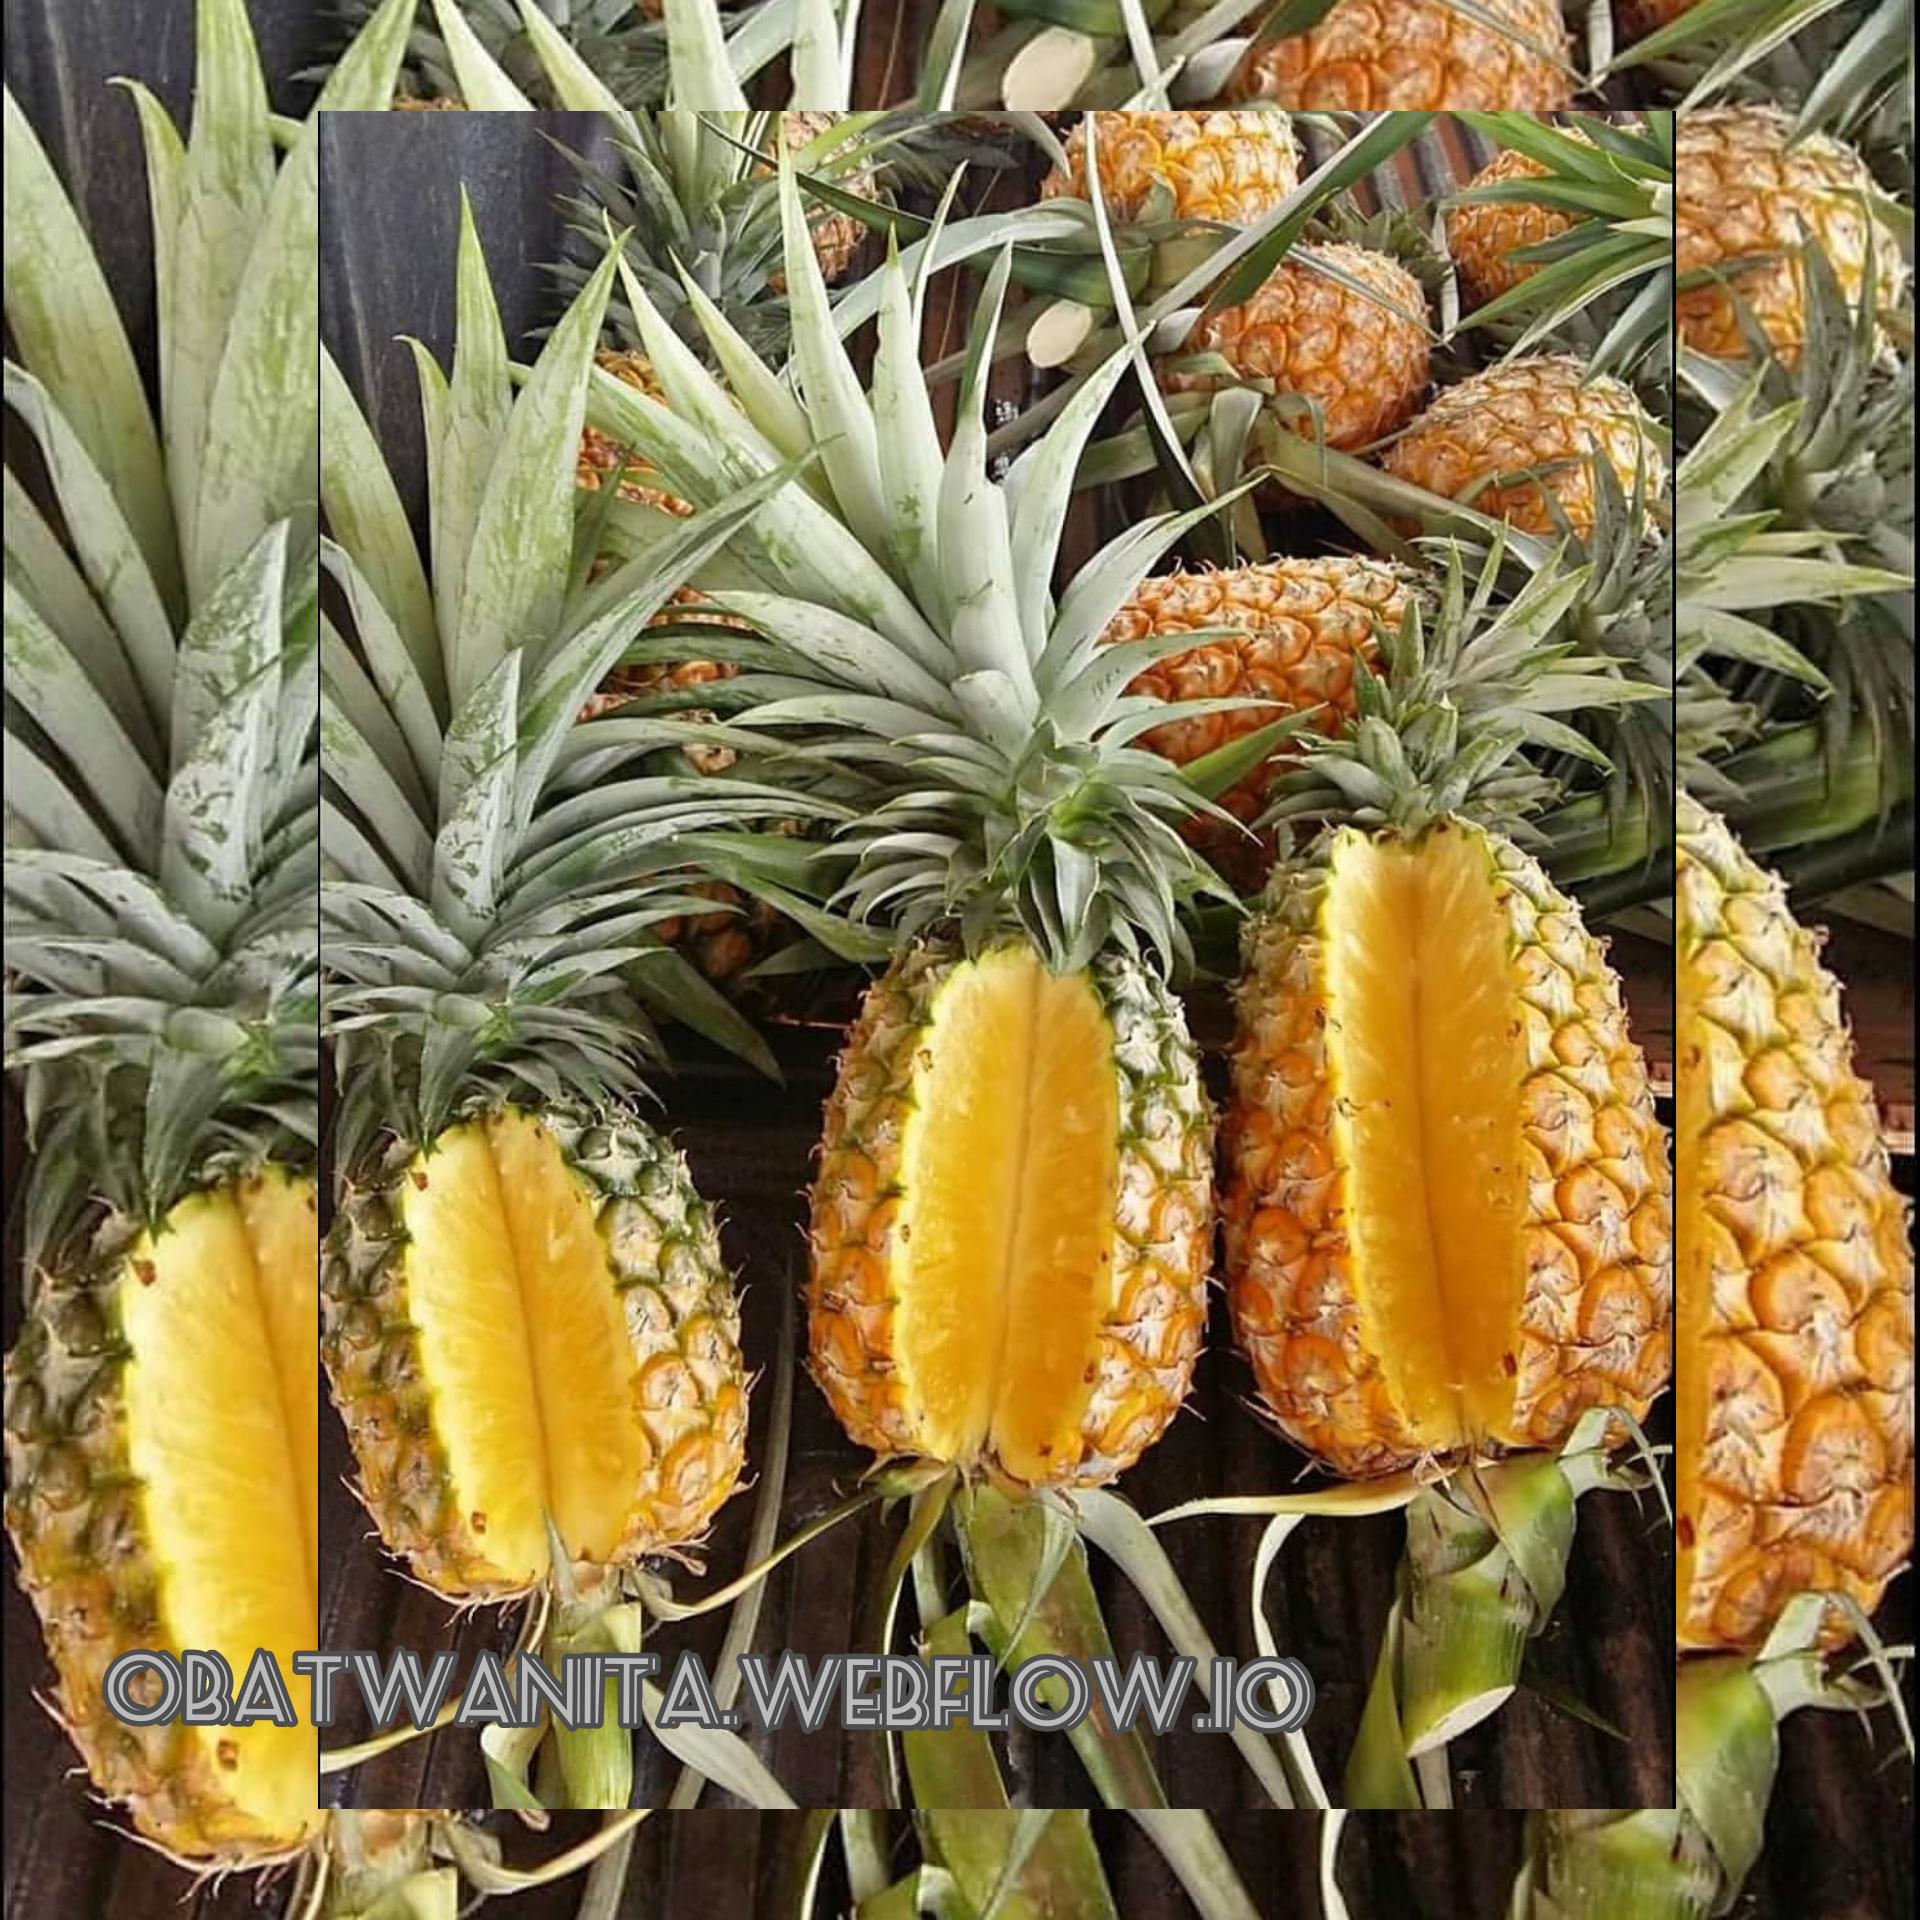 efek-samping-buah-nanas